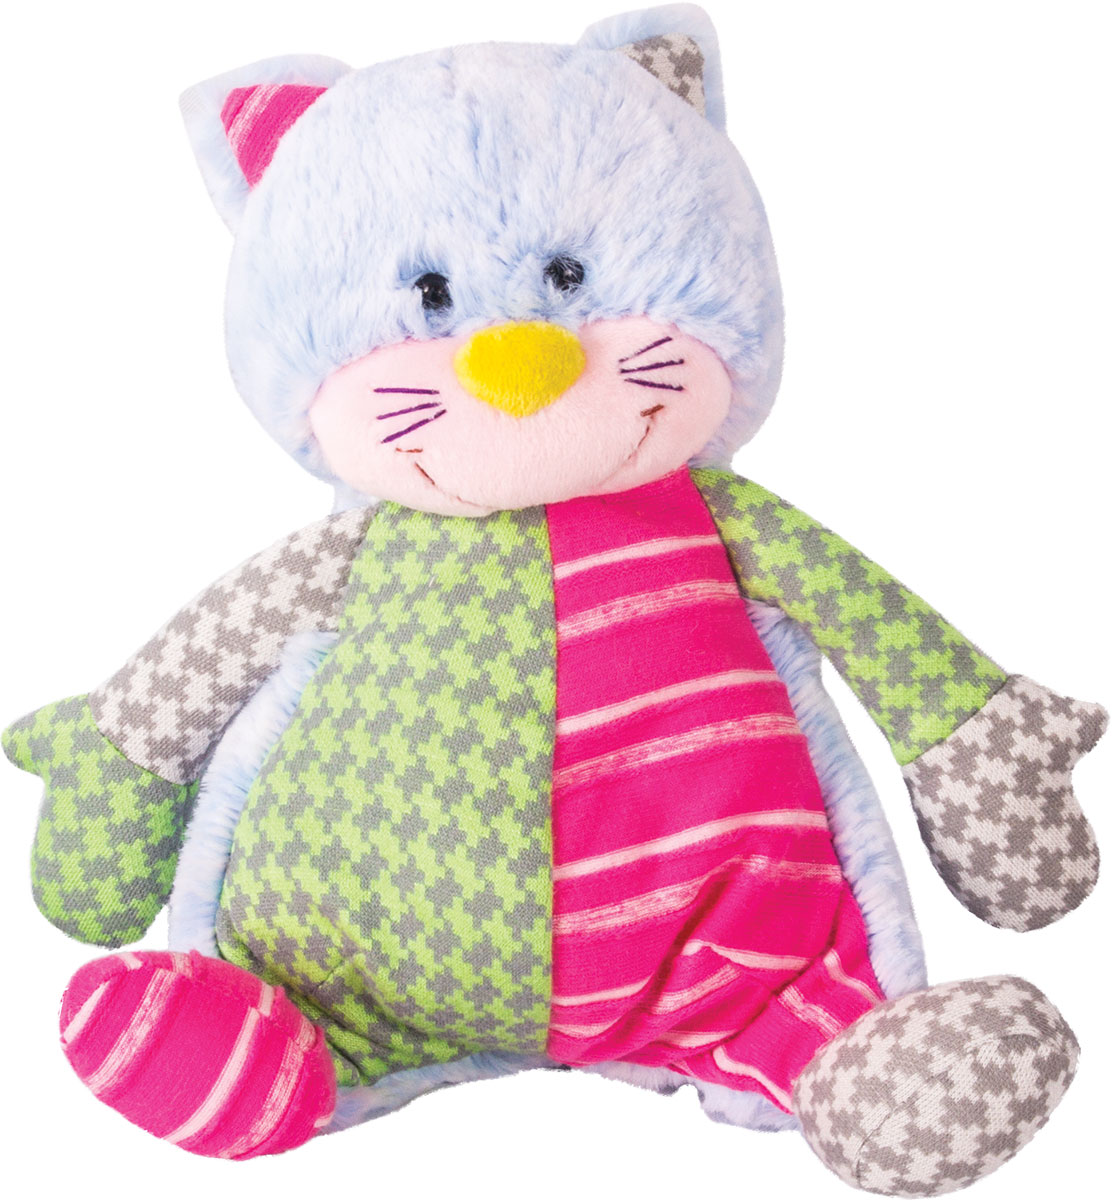 Gulliver Мягкая игрушка Котик цветной 21 см gulliver gulliver мягкая игрушка собака пупс 29 см